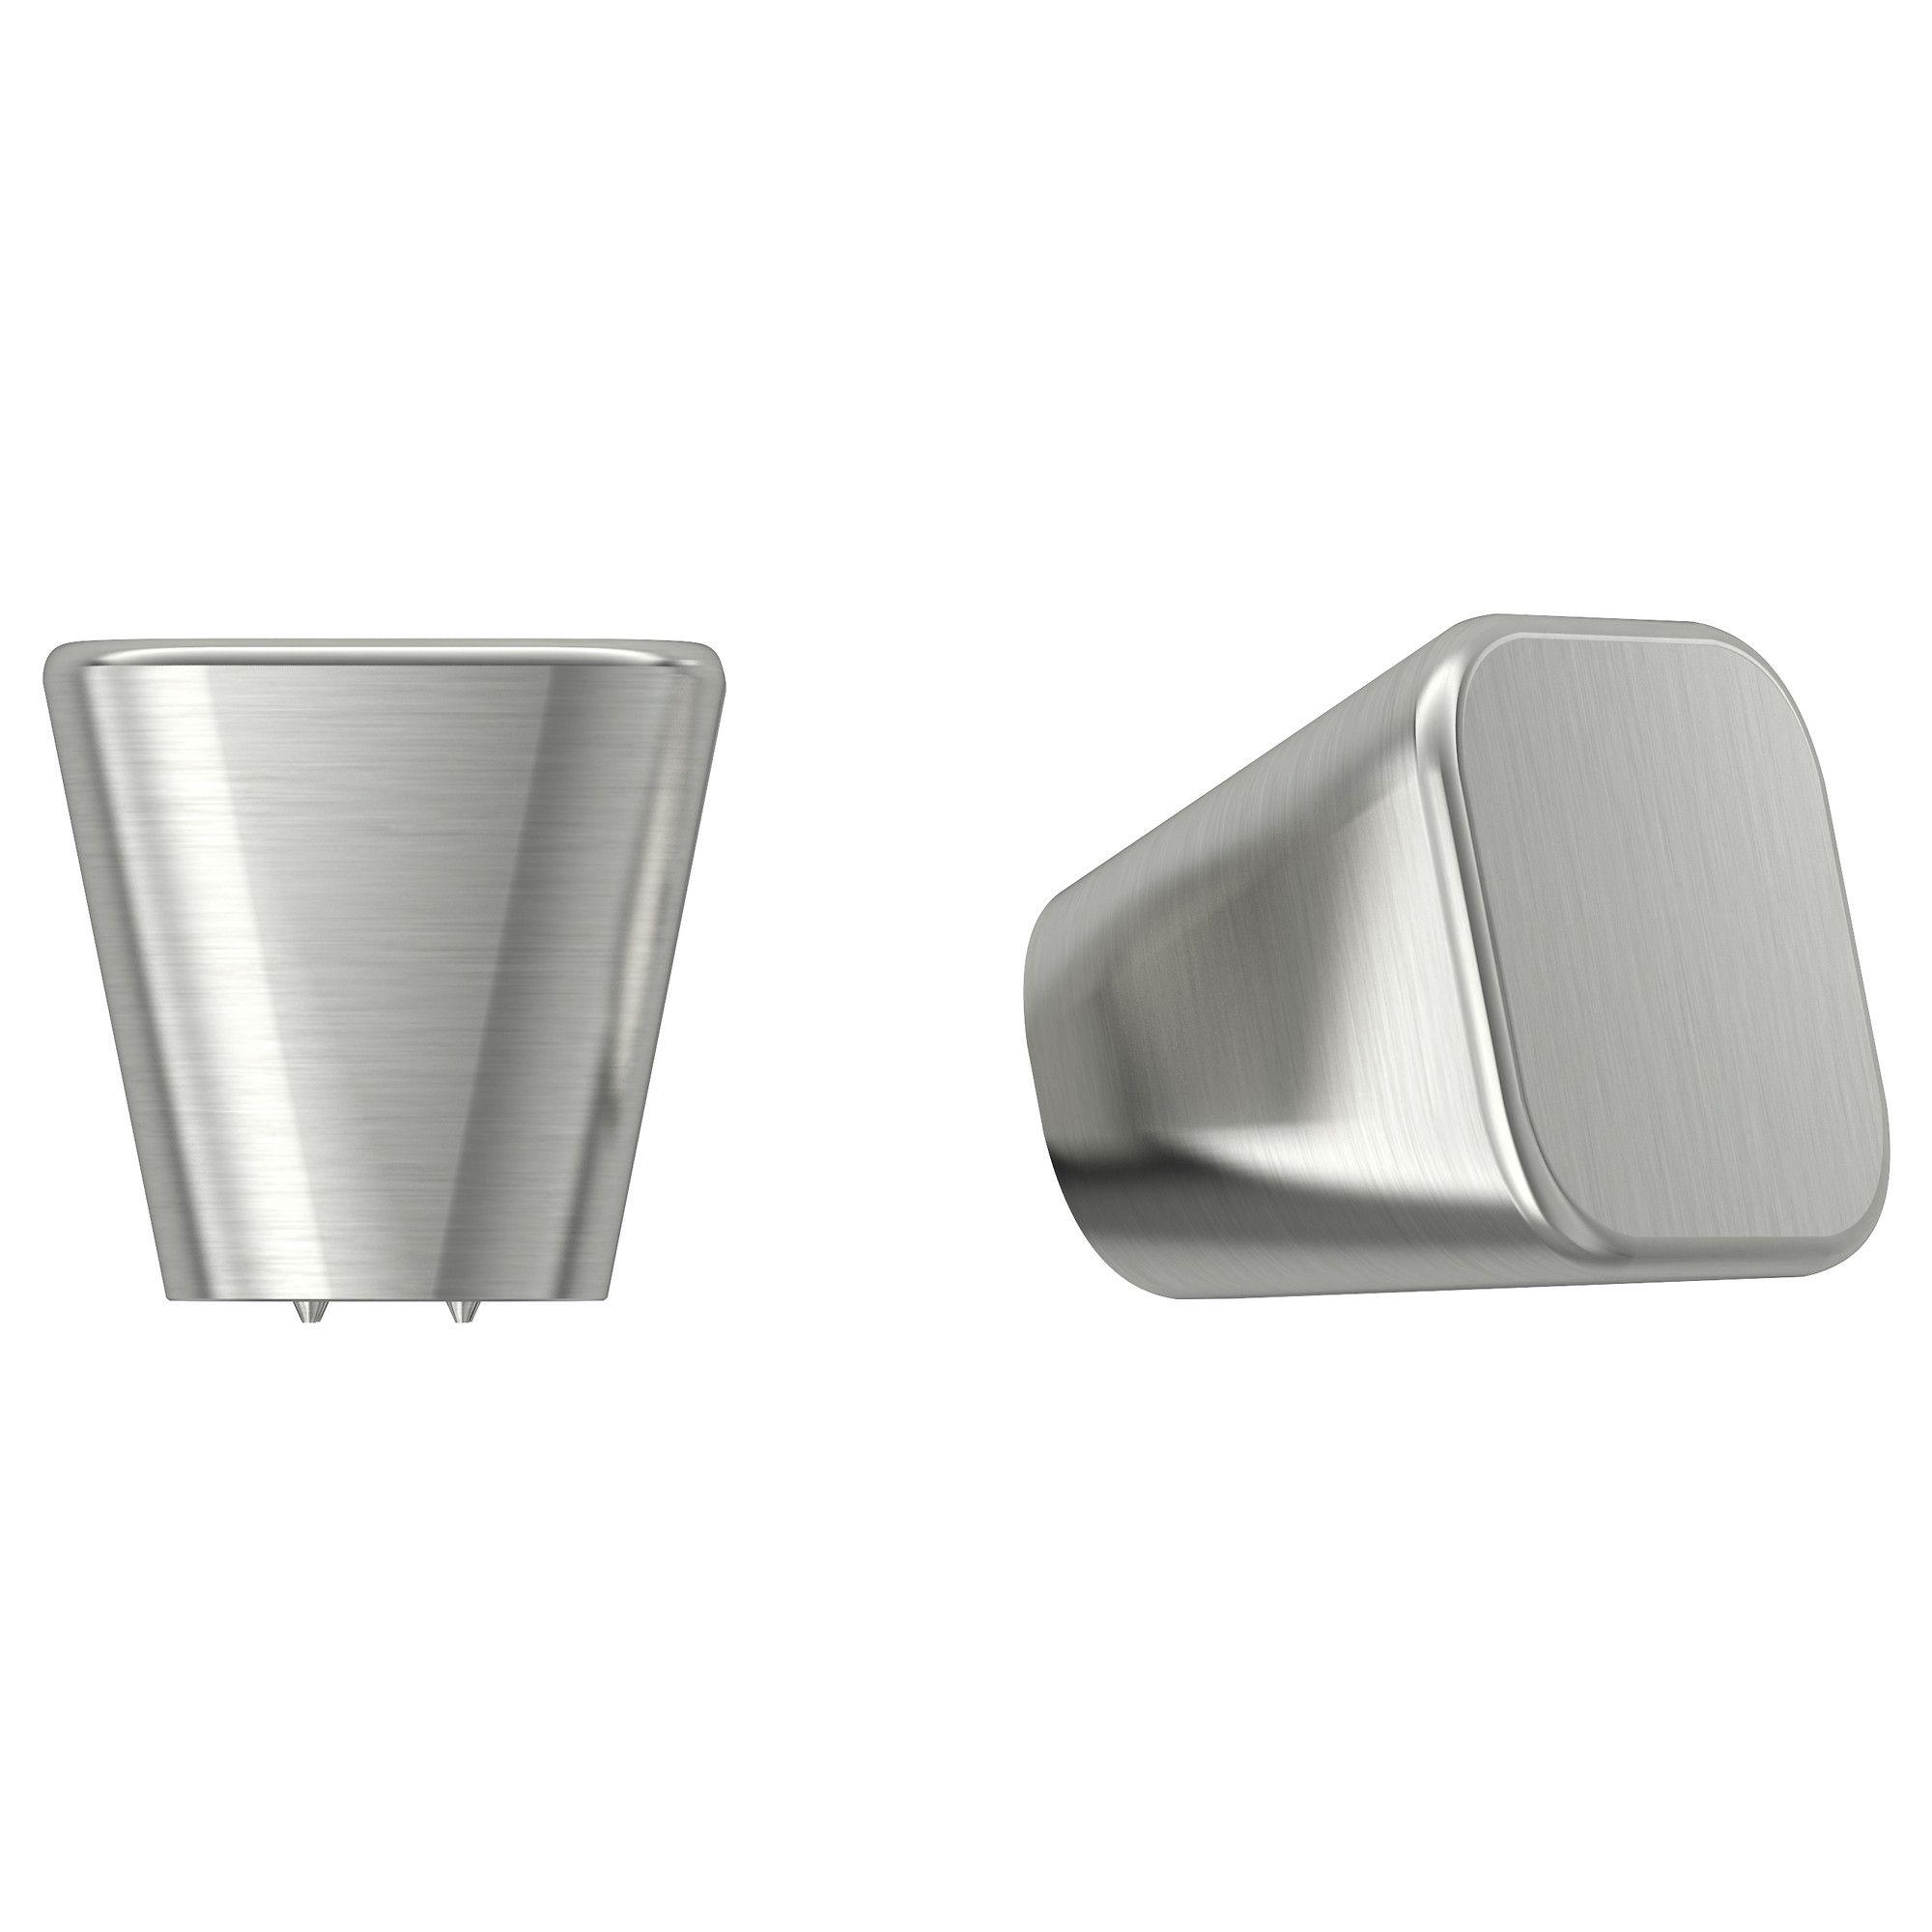 Kitchen Cabinet Handles Ikea: Kitchen Cabinet Hardware BASTIG Knob - IKEA